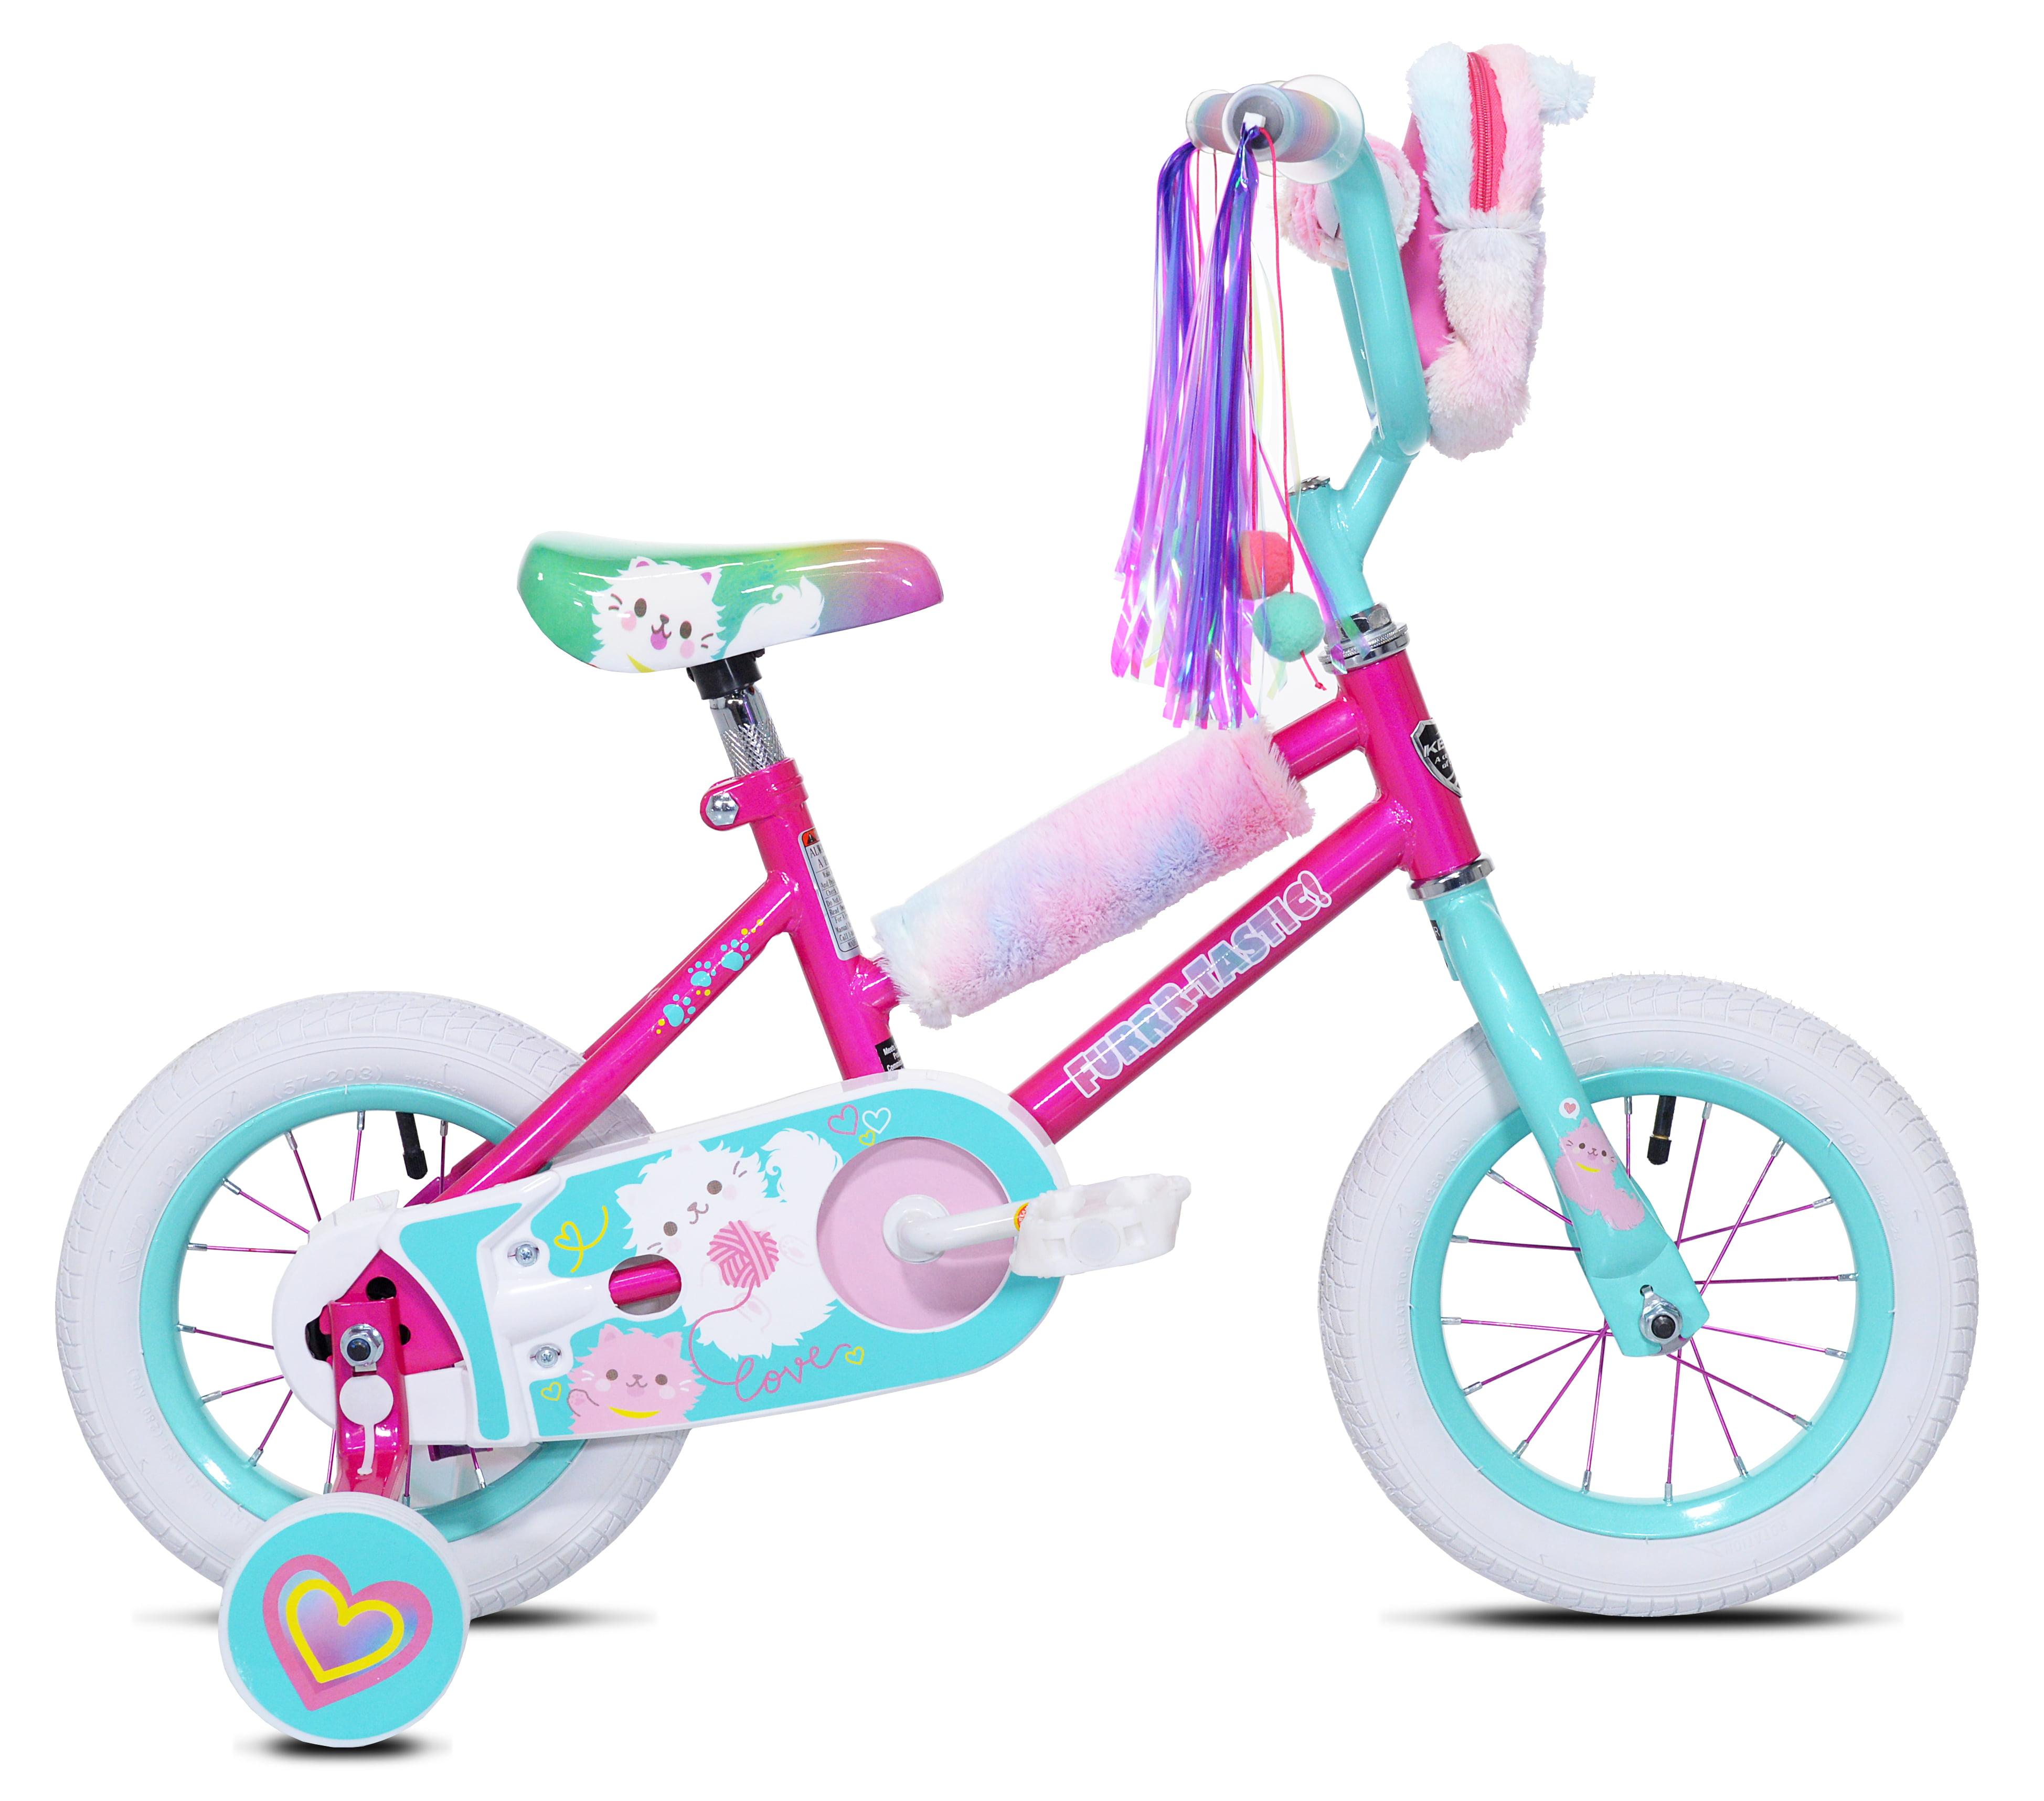 SET OF 10 BMX BIKE BICYCLE STICKERS DECALS TRANSFERS BLUE PIRANHA